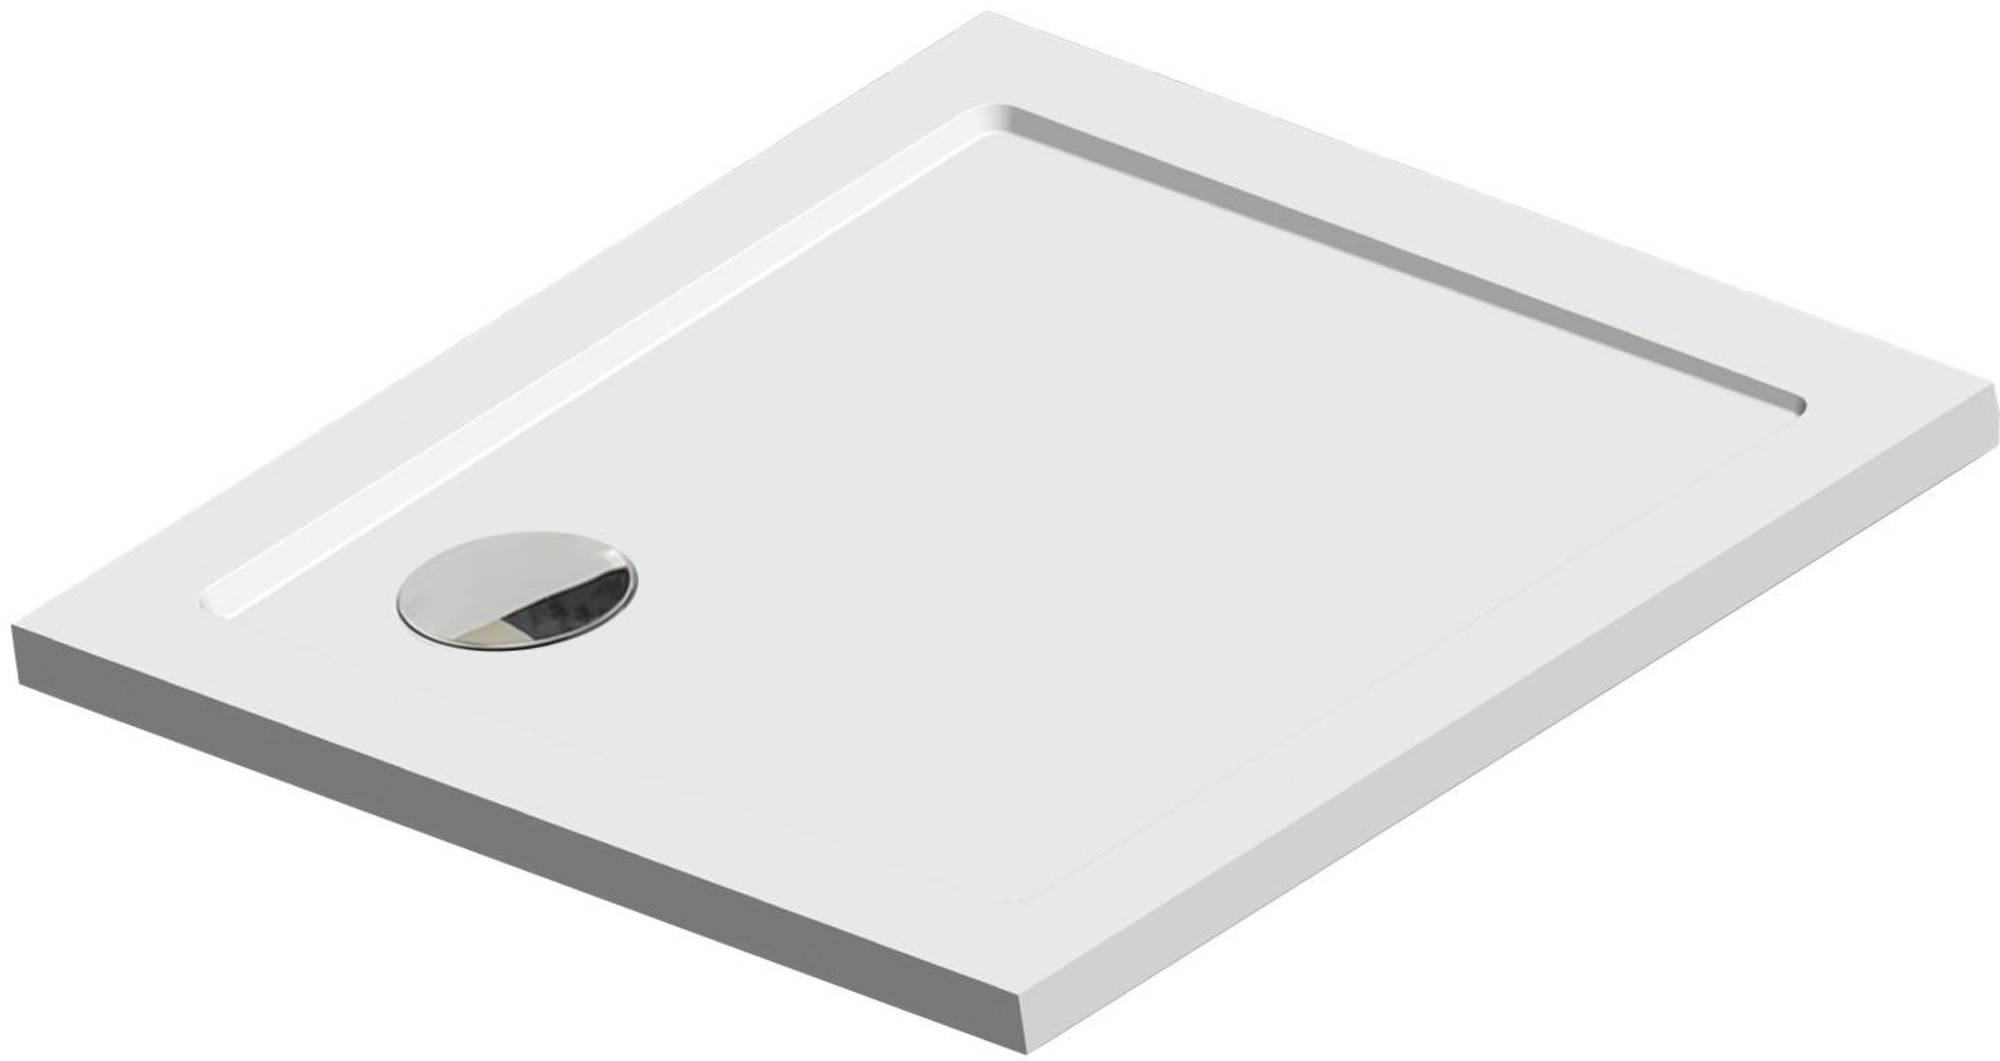 Sealskin Fusion douchebak vierkant inbouw 90